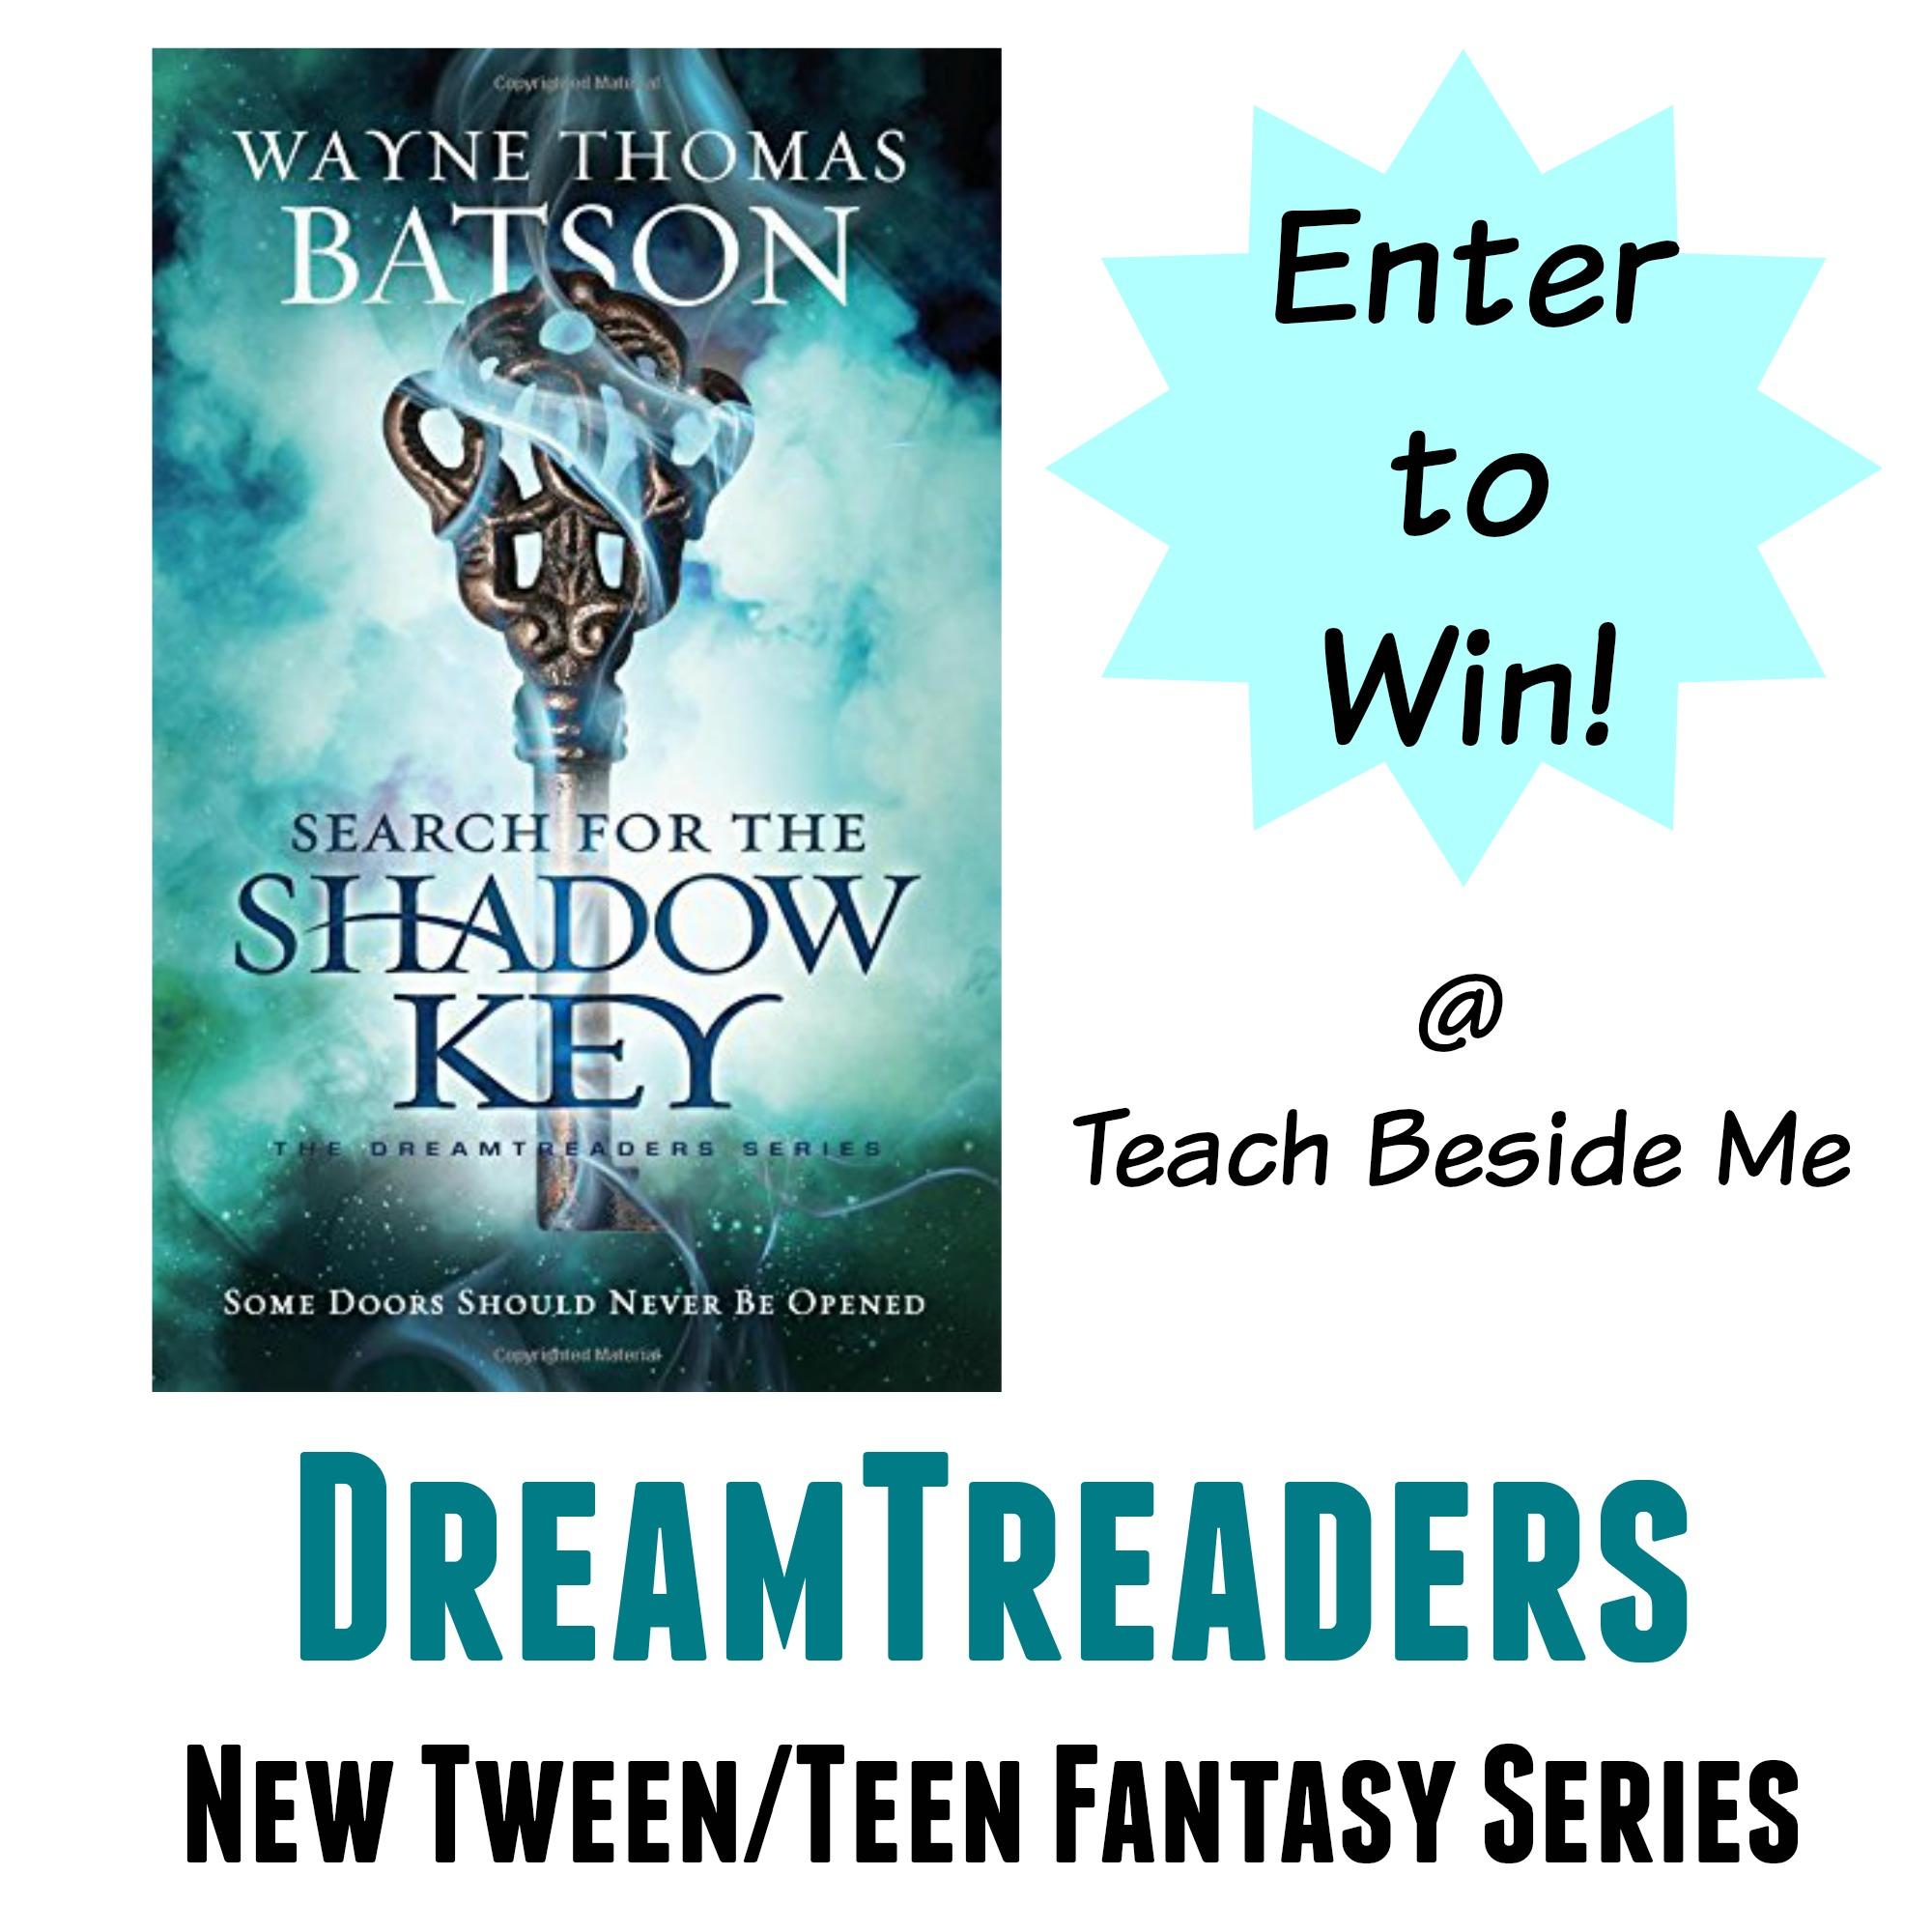 DreamTreaders Shadow Key